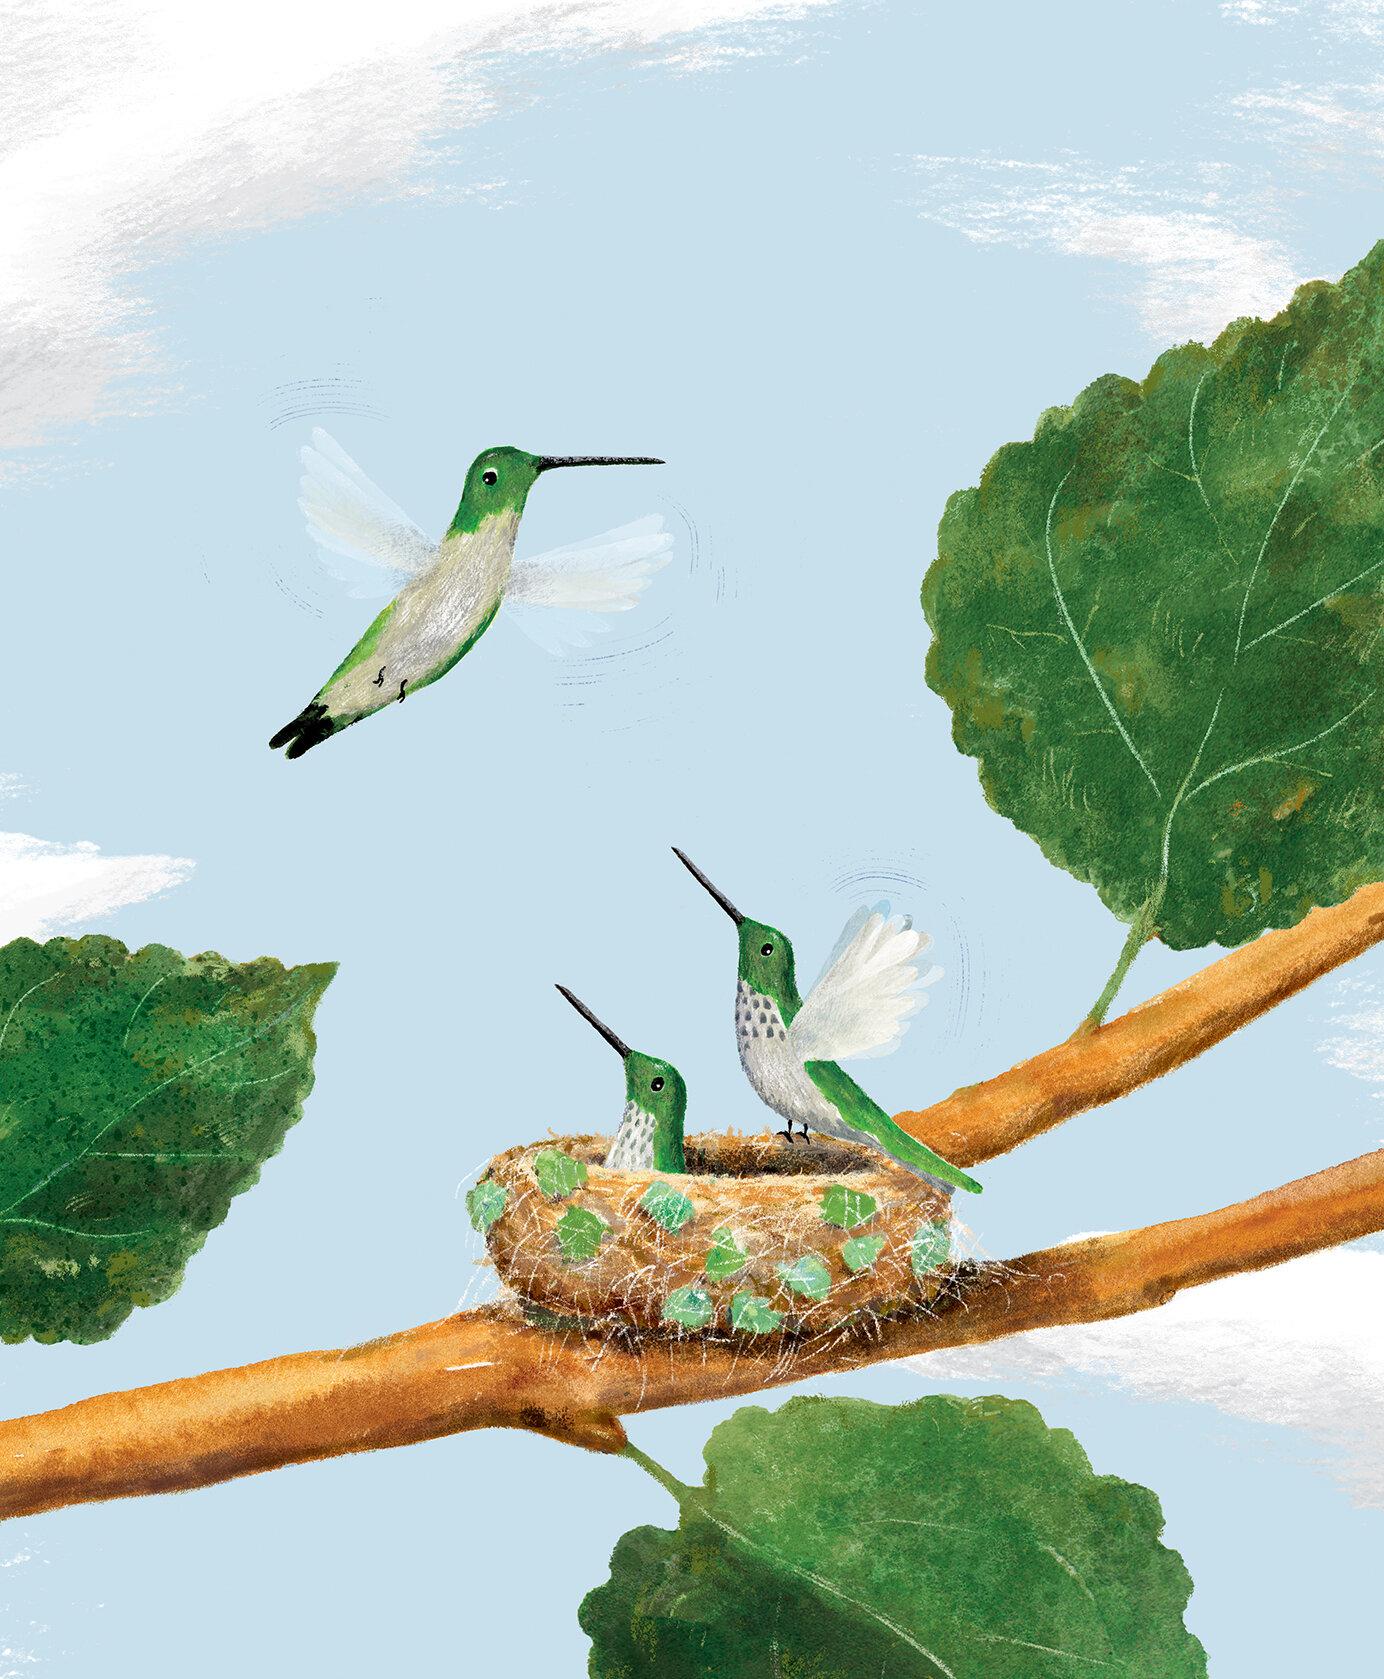 Paul Meisel-My Tiny Life by Ruby T. Hummingbird